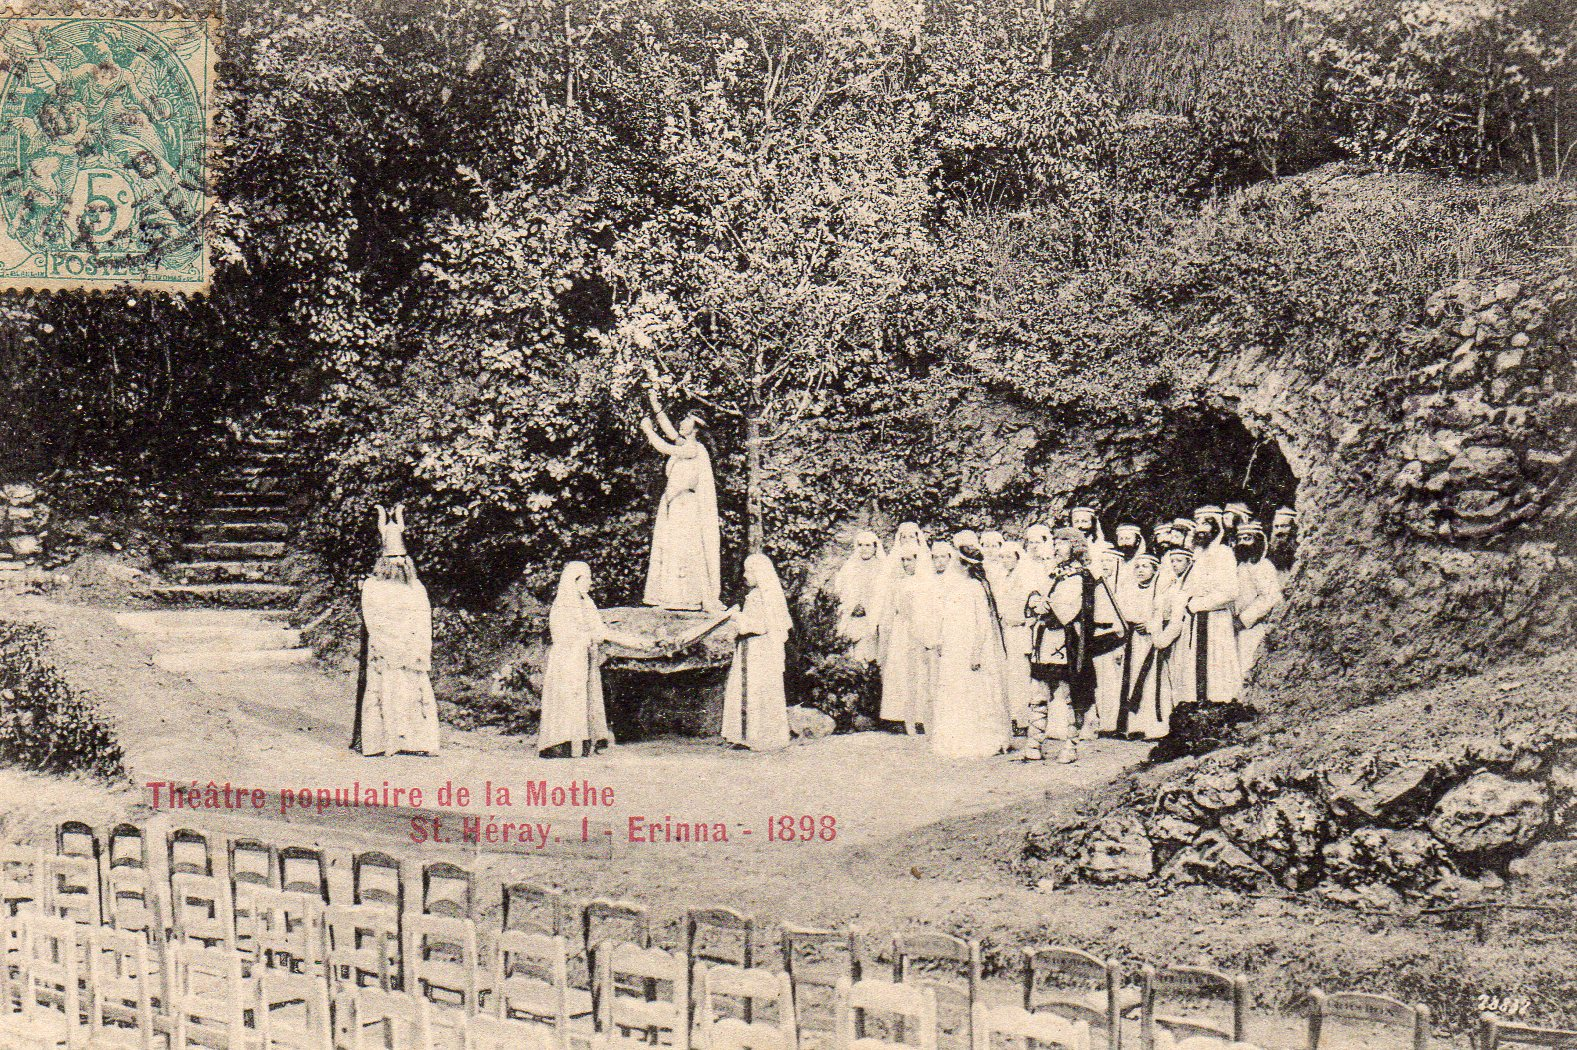 Theatre populaire la Mothe 1898.jpg